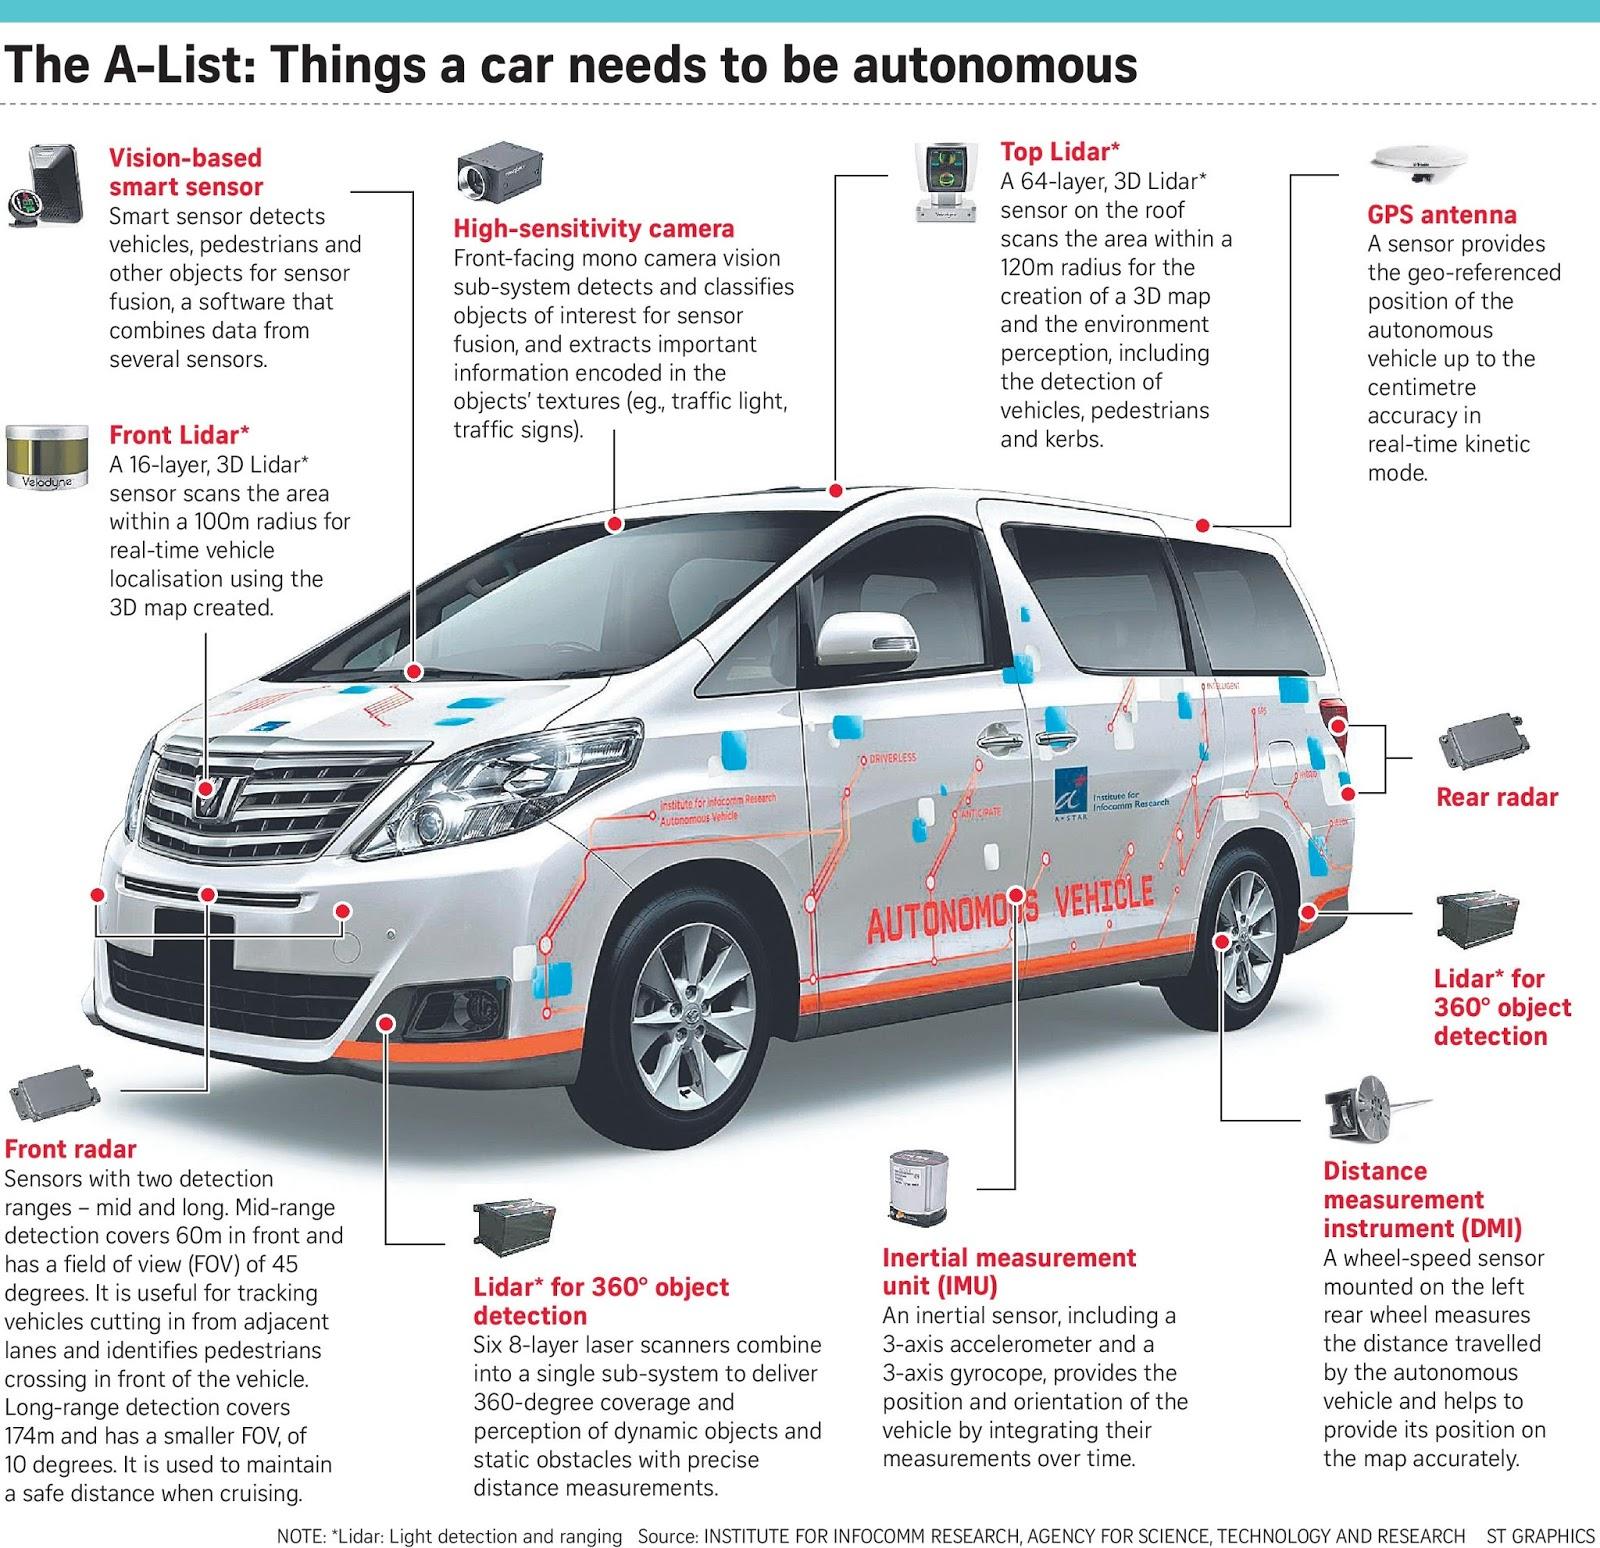 Singapura Gunakan Mobil Tanpa Kemudi Bersihkan Kota Car